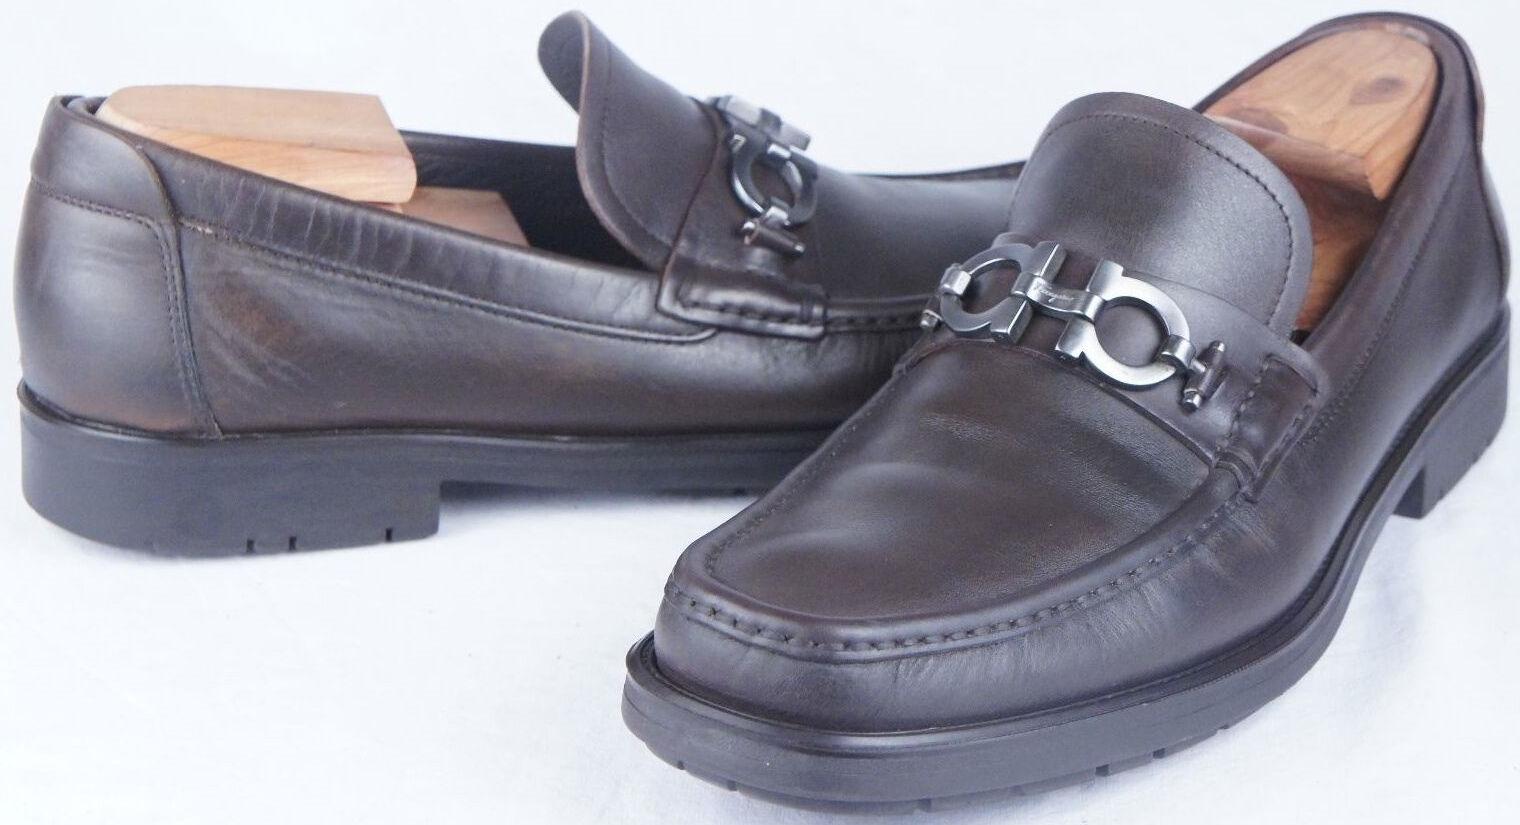 Top 10 Italian Shoes for Men | eBay